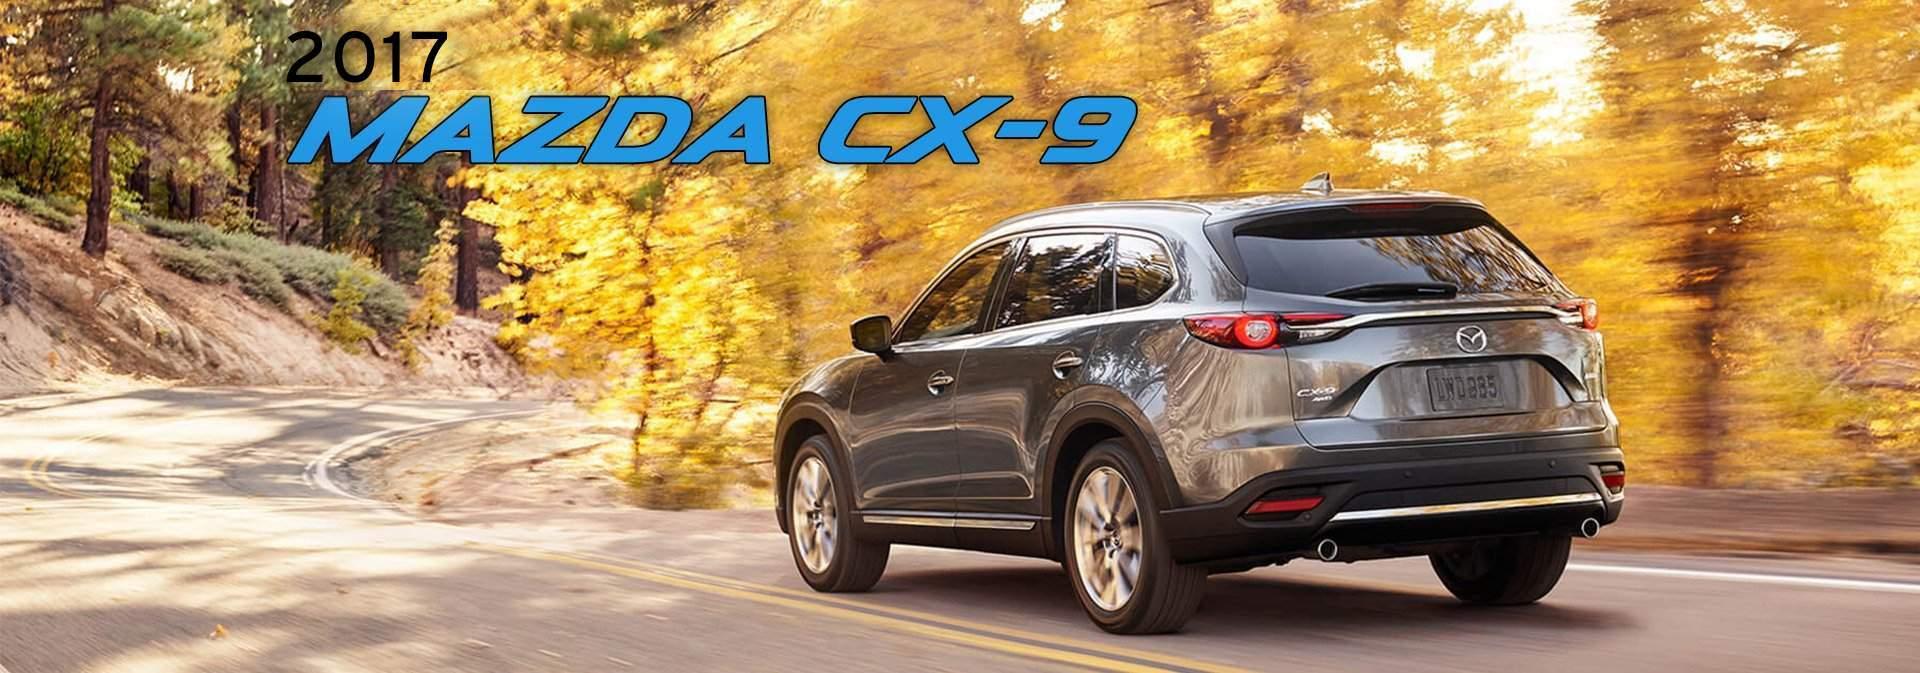 Mazda Dealership Bloomington IN Used Cars Royal South Mazda - South mazda